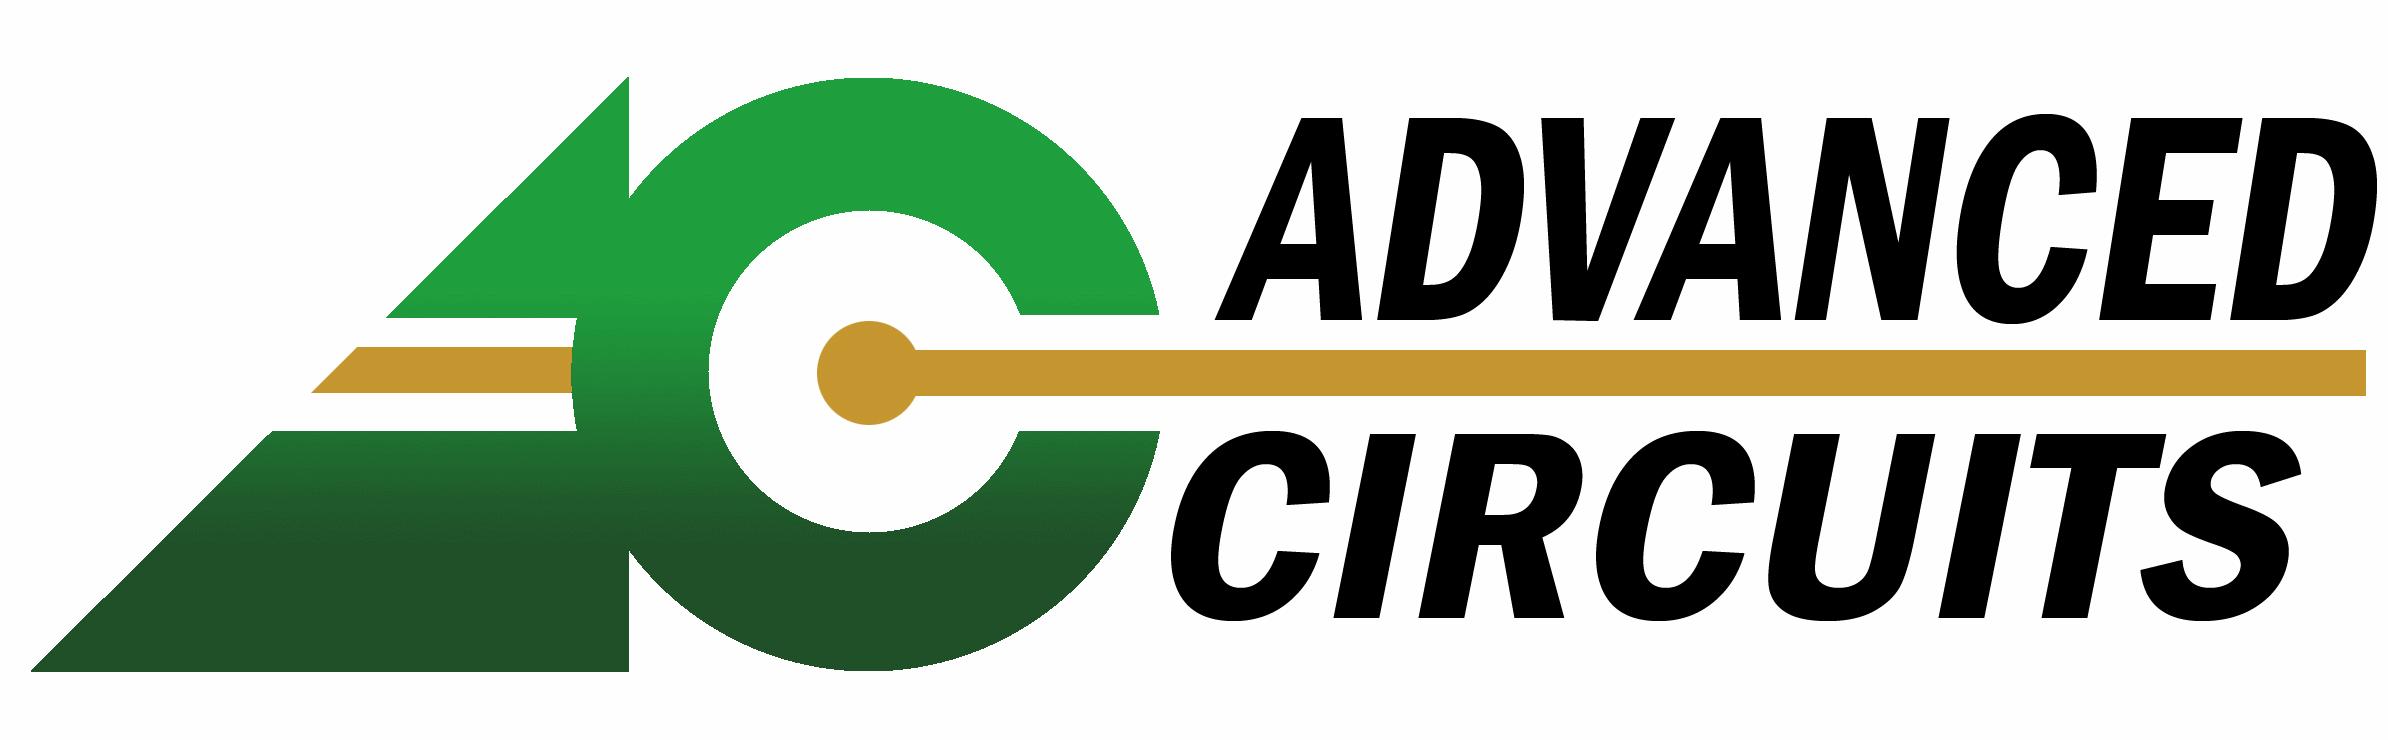 Advanced_Circuits.png